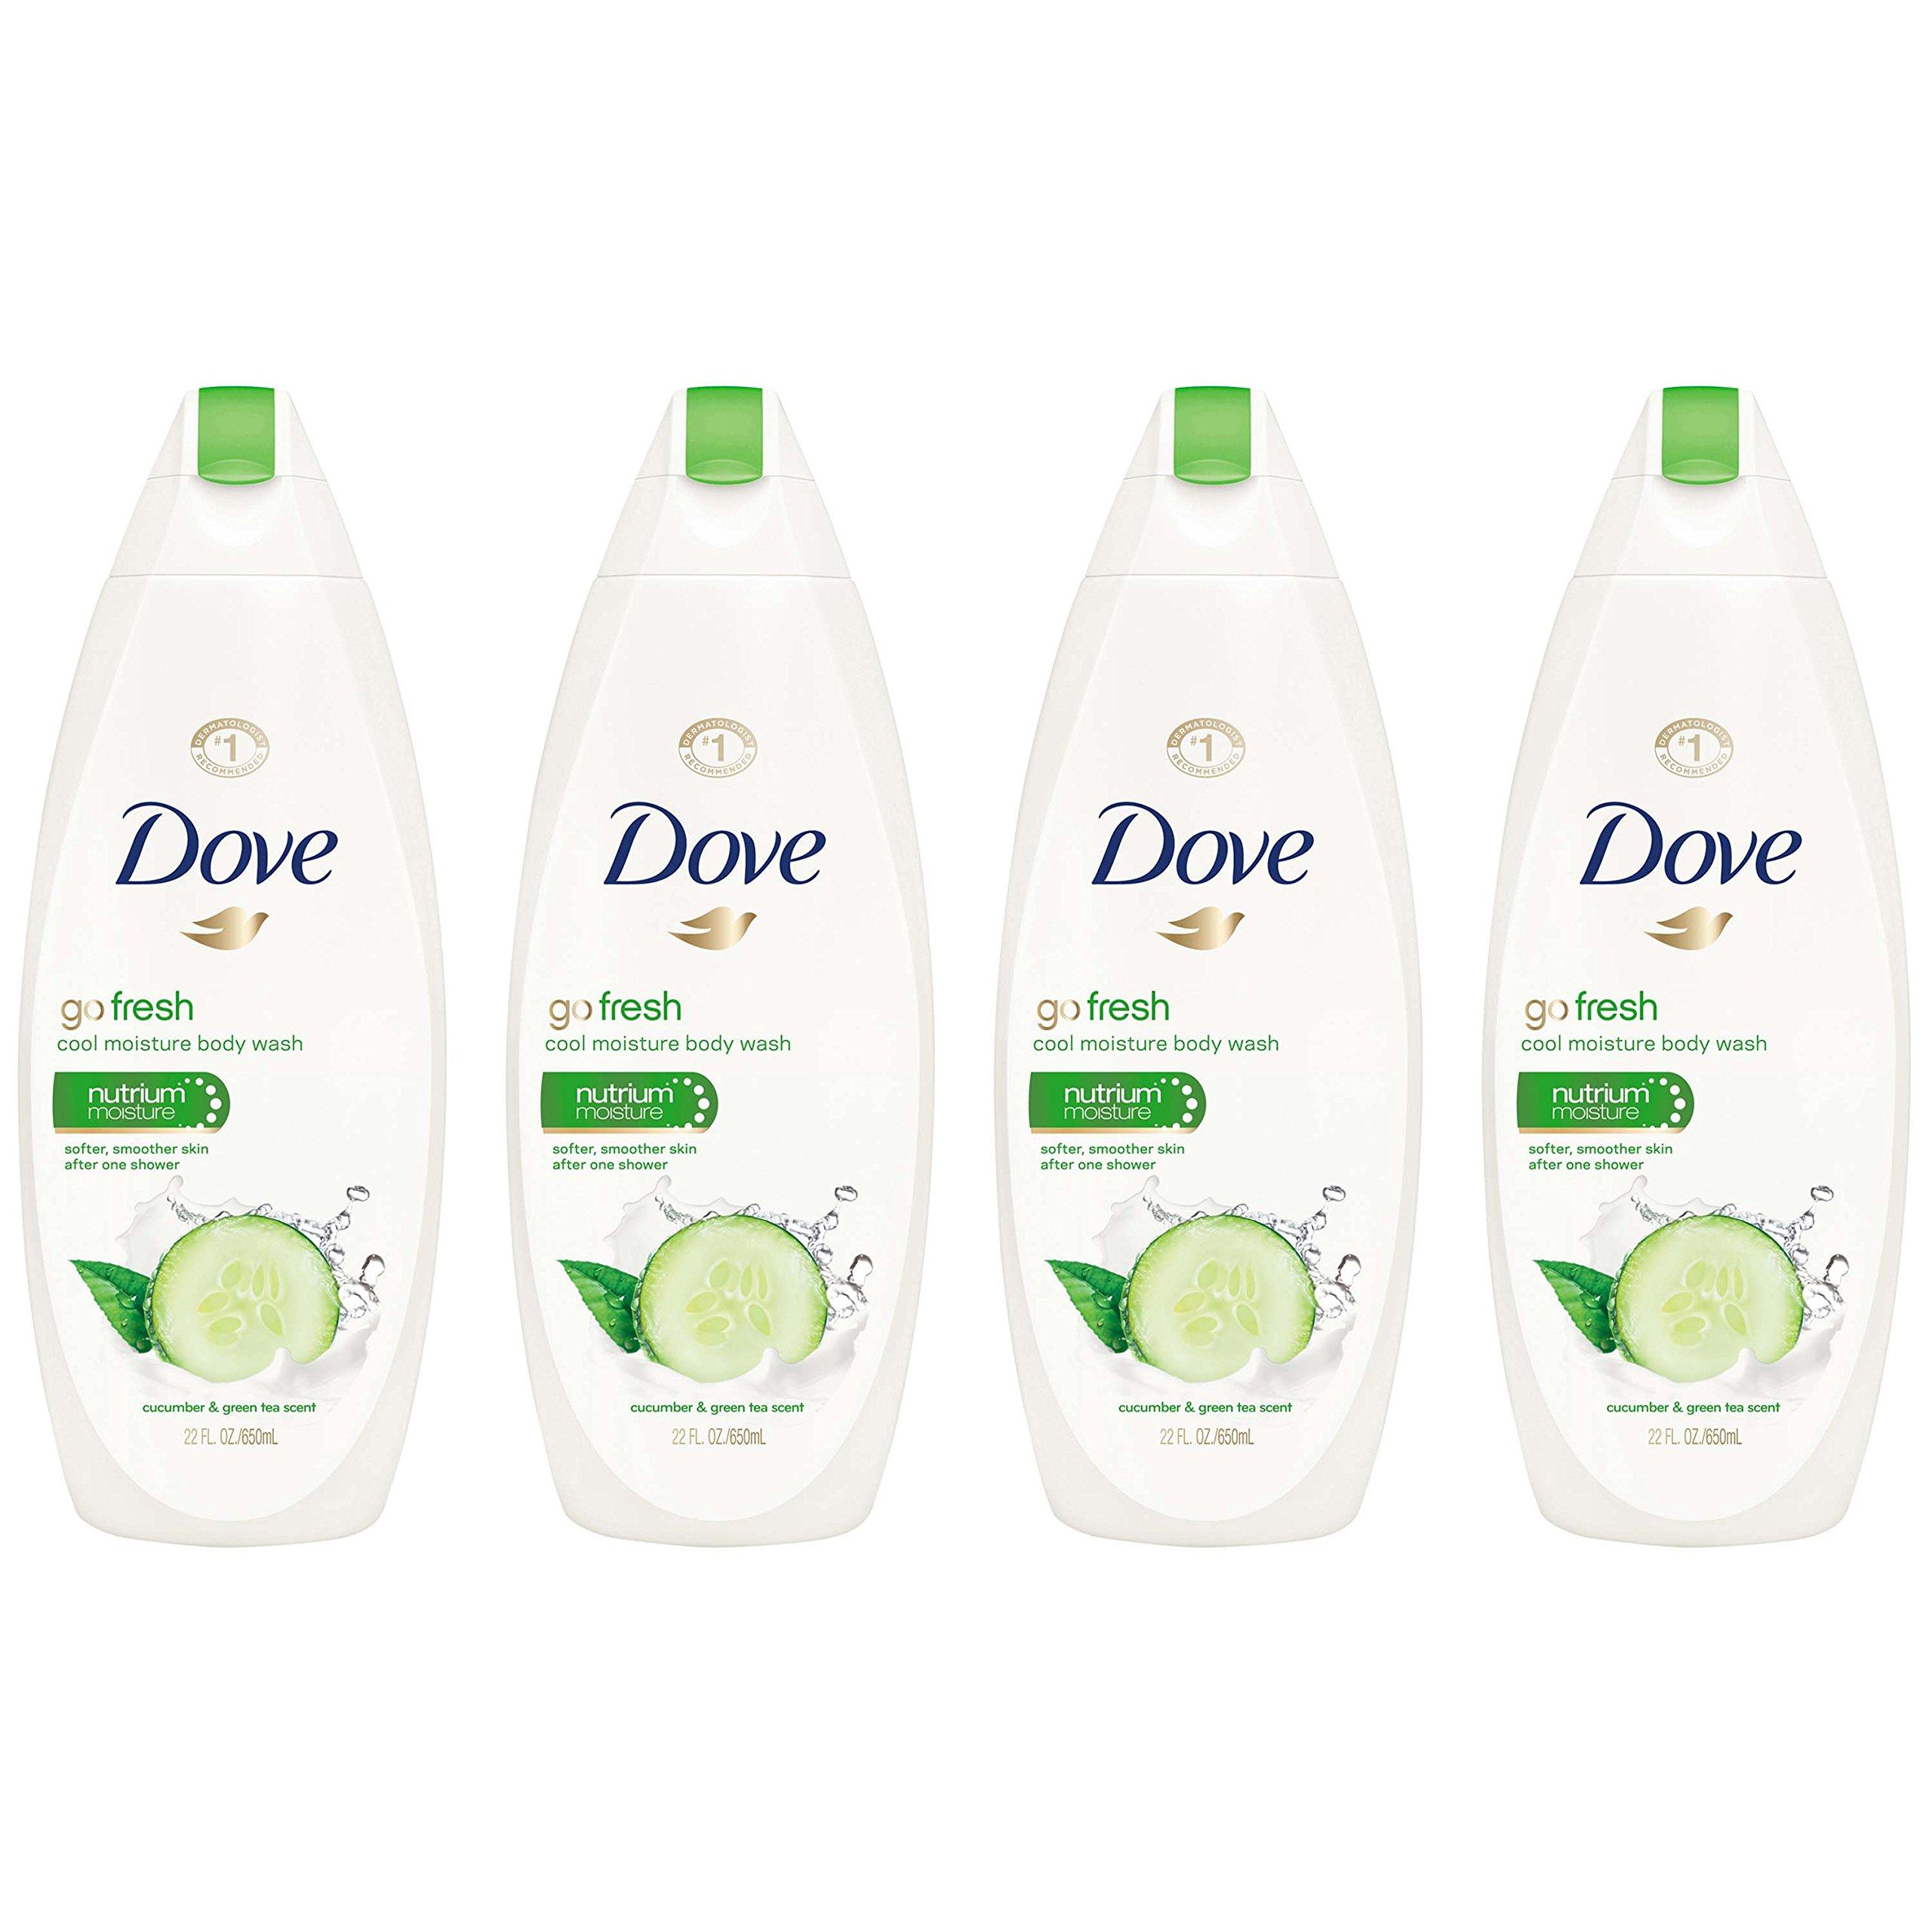 Dove go fresh Body Wash Cucumber and Green Tea 22 oz, Pack of 4